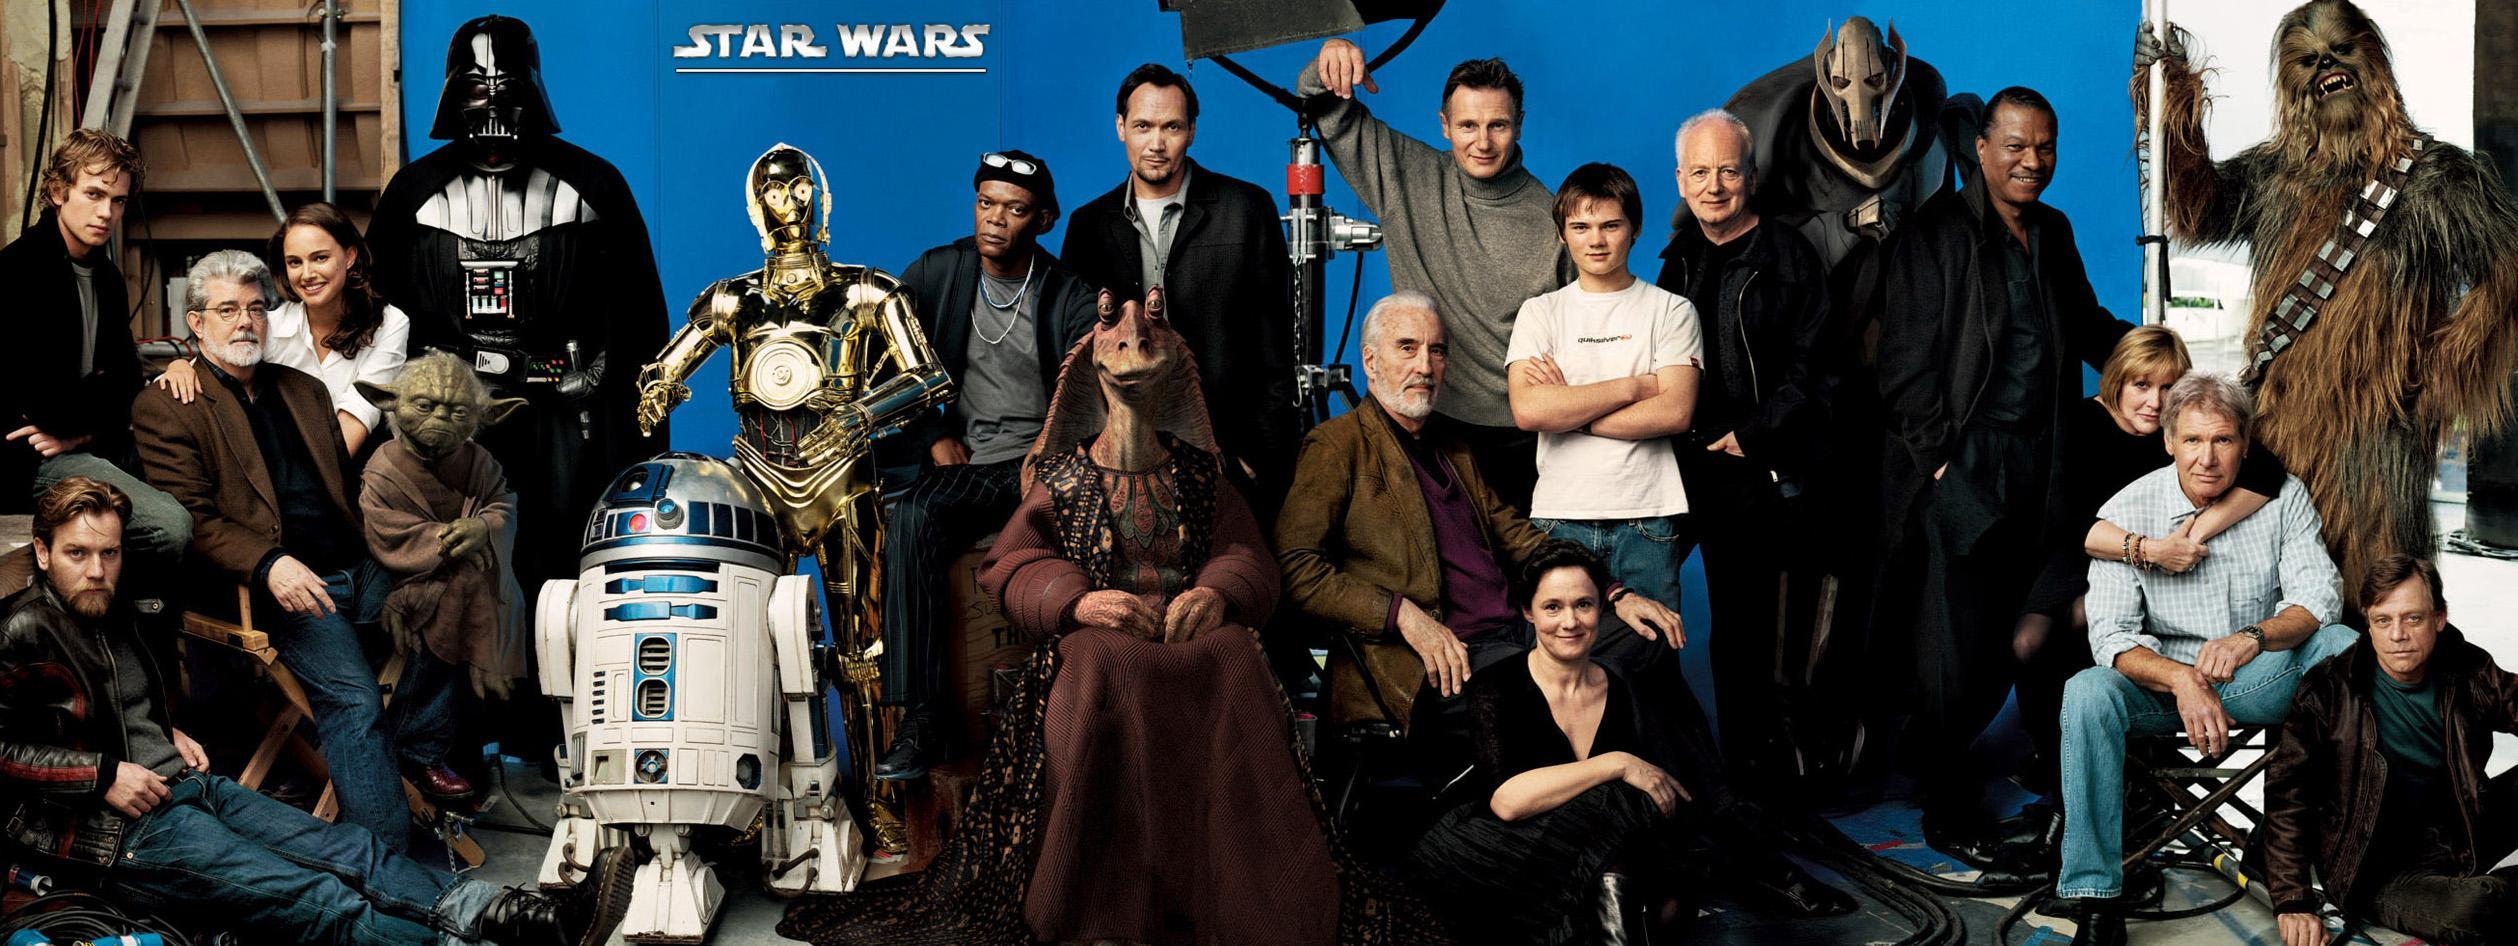 Dessins en couleurs imprimer star wars num ro 692386 - Personnage star wars 7 ...